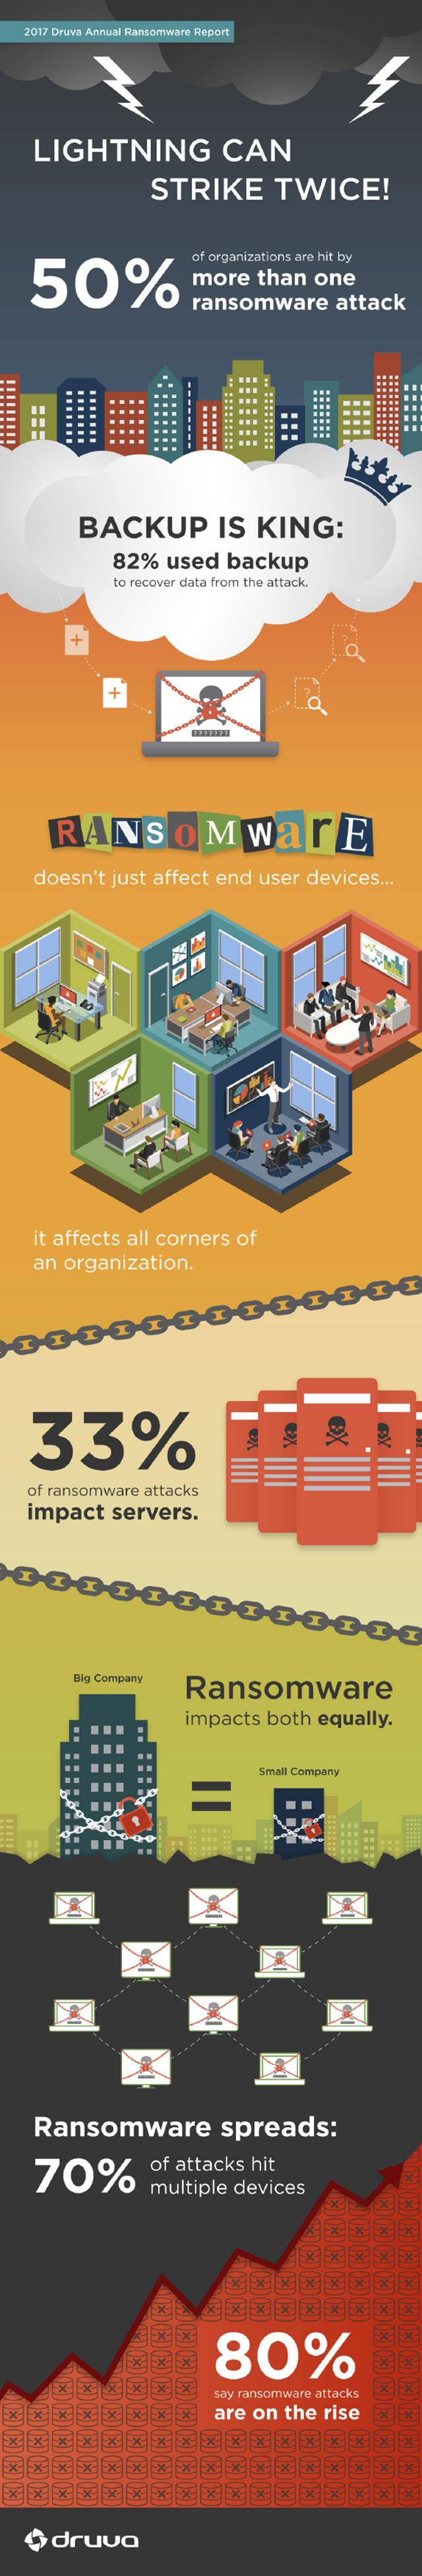 Druva-2017RansomwareReport-Infographic.jpg